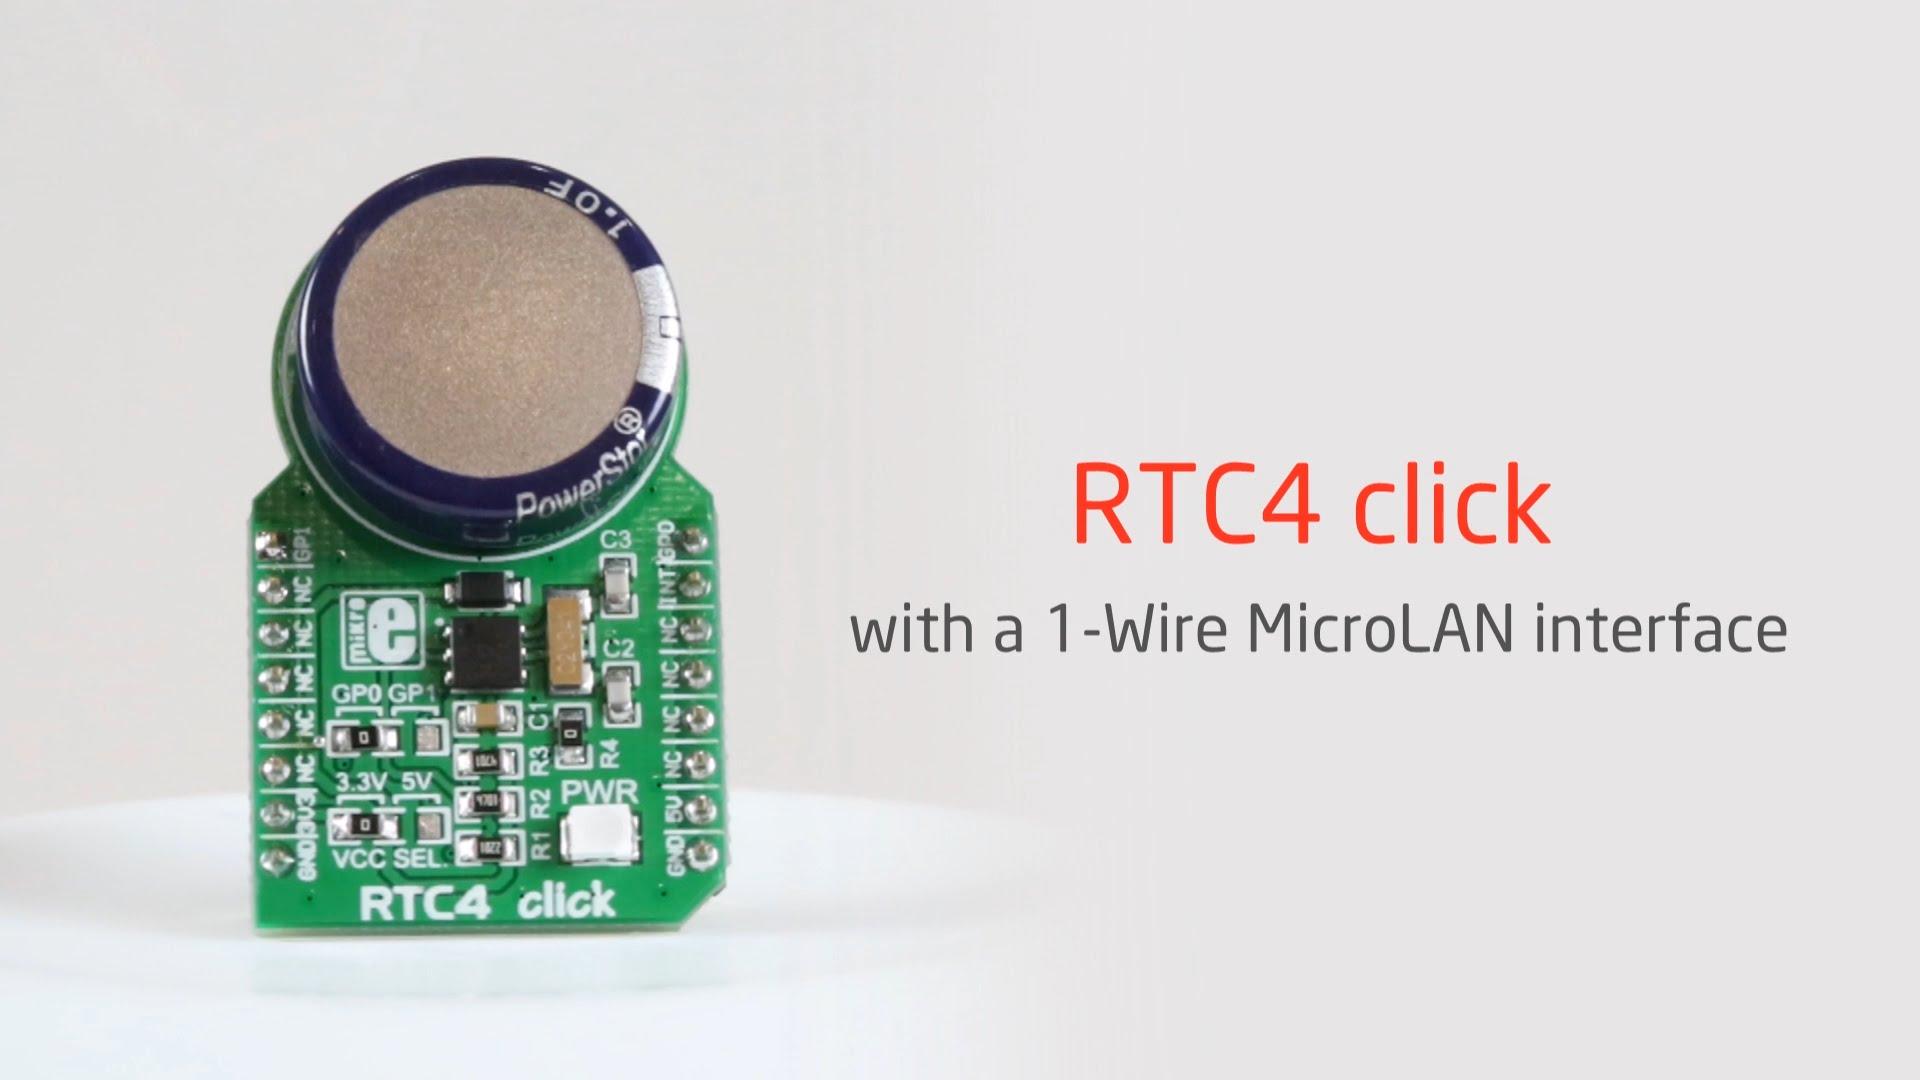 RTC4 click released